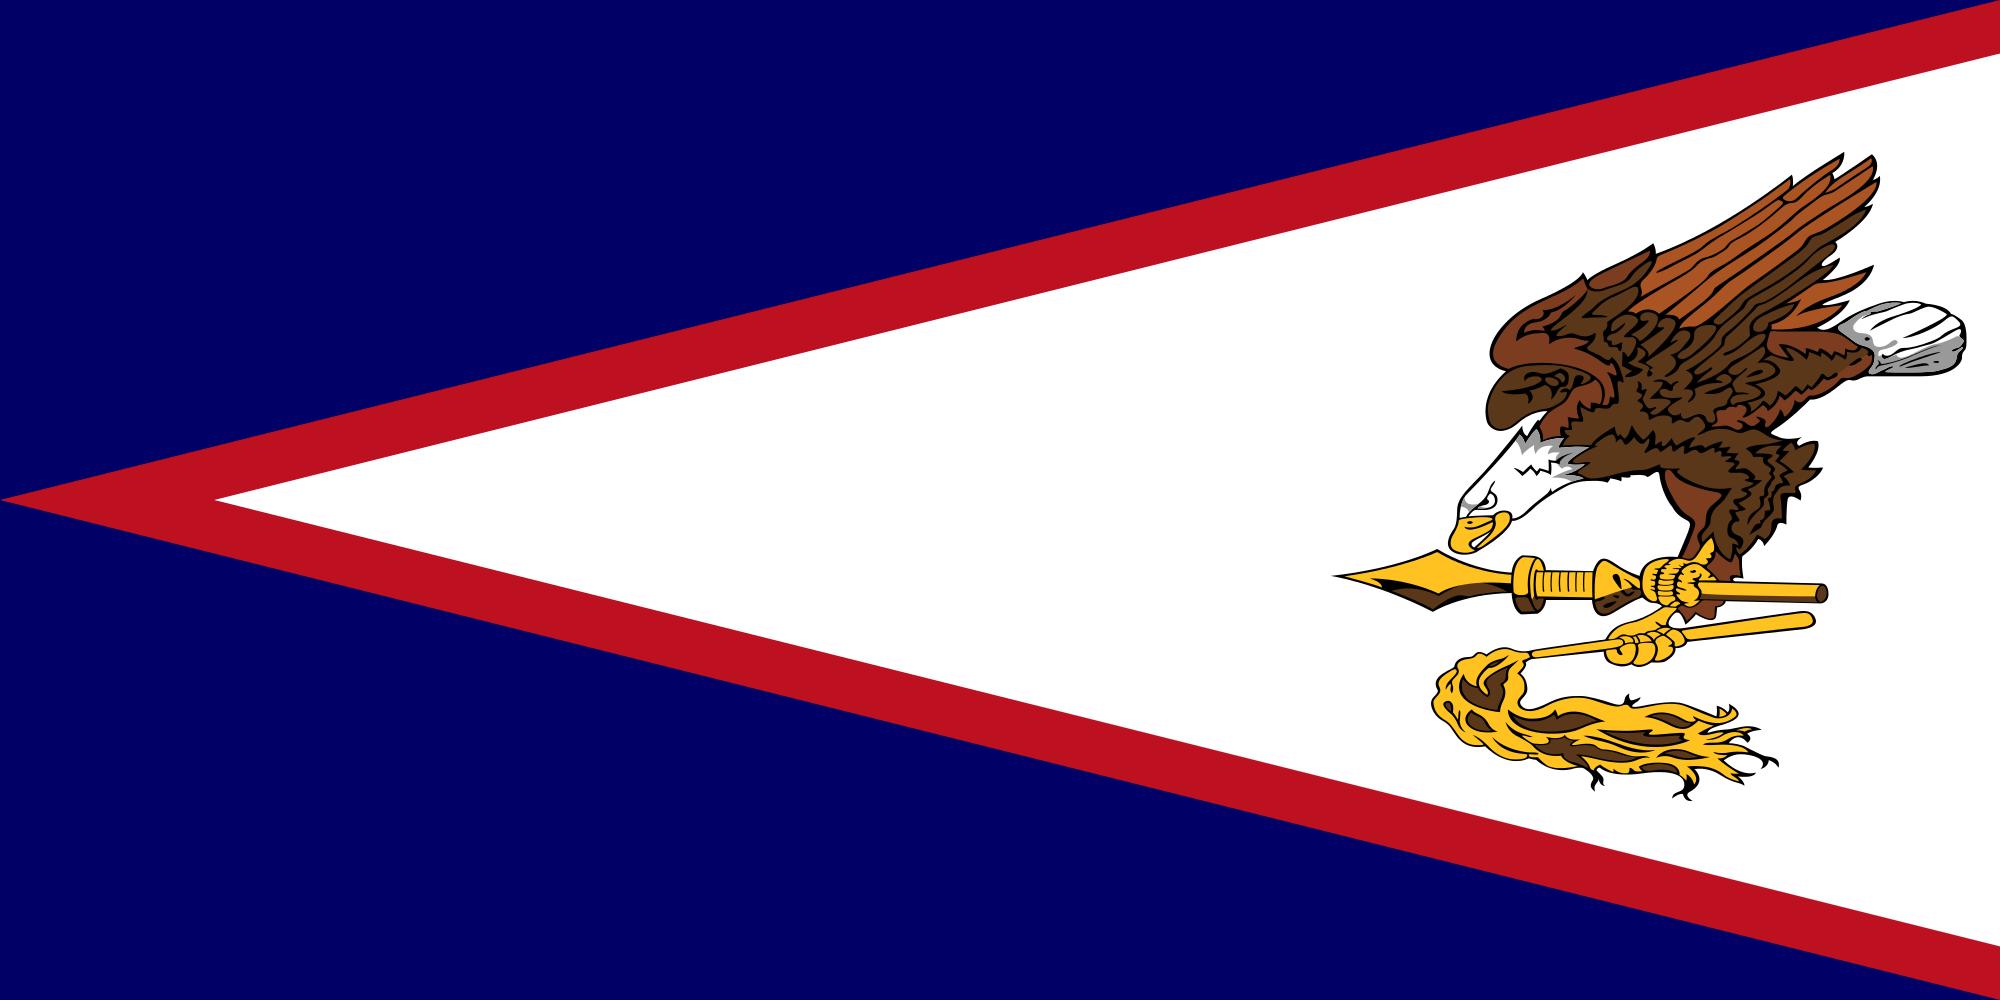 samoa americana, paese, emblema, logo, simbolo - Sfondi HD - Professor-falken.com